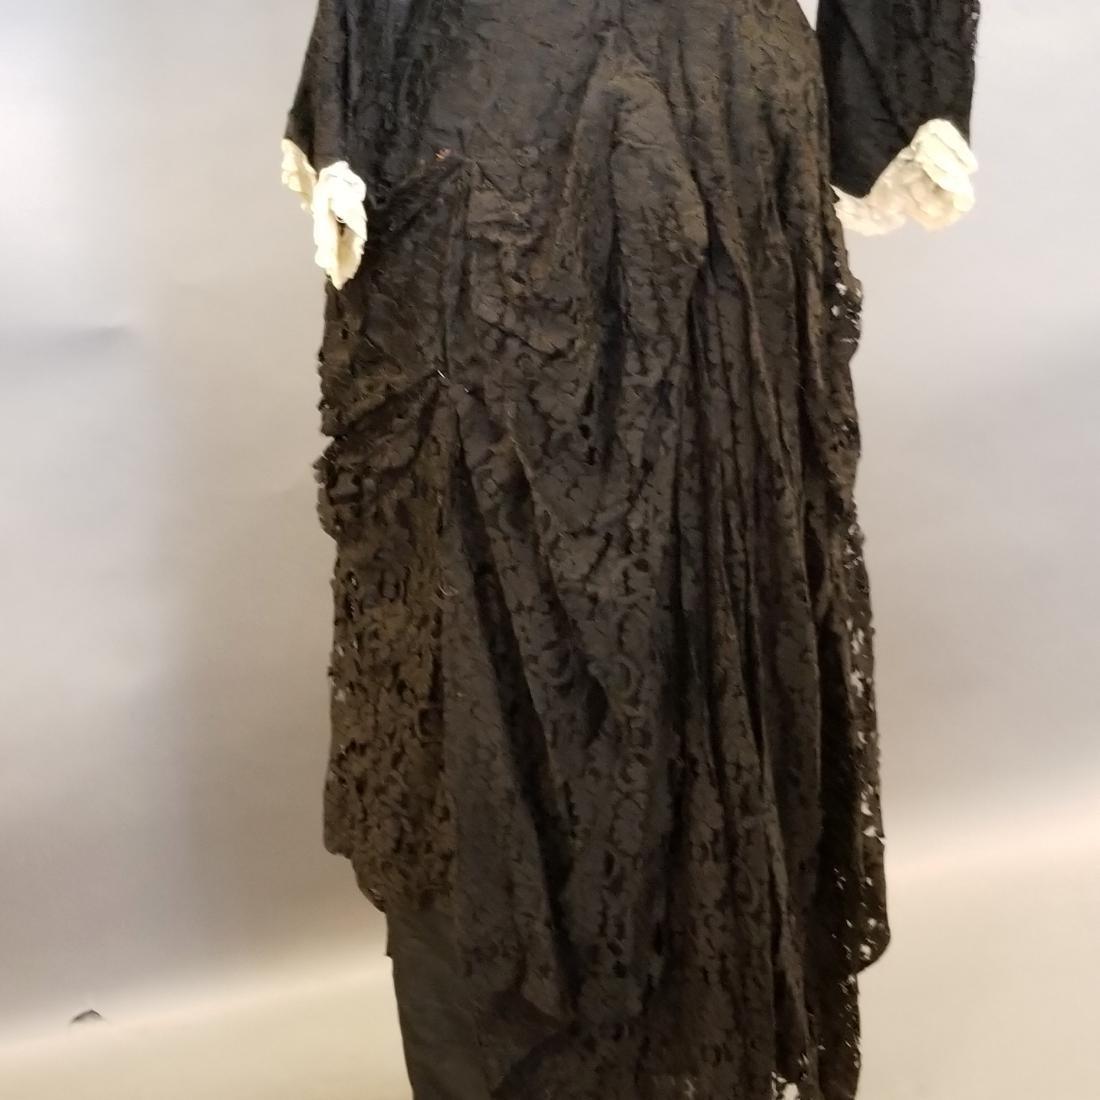 Black Lace Reception Dress - 5